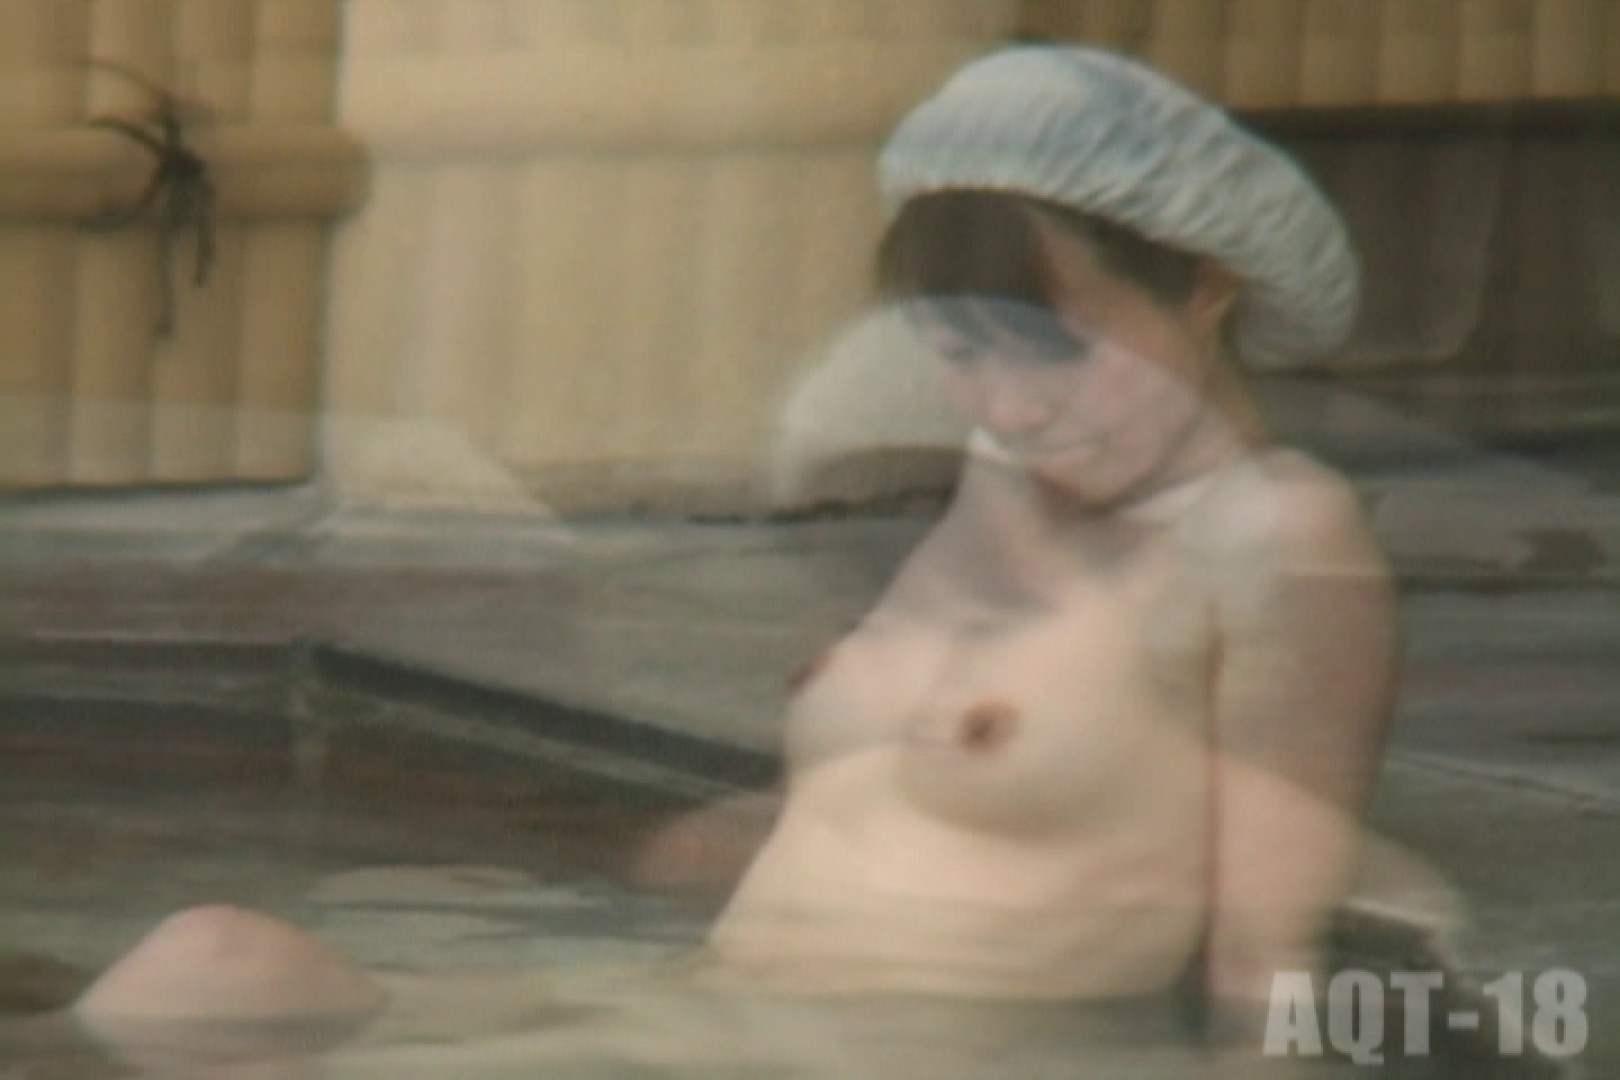 Aquaな露天風呂Vol.864 盗撮 のぞき動画画像 68画像 35